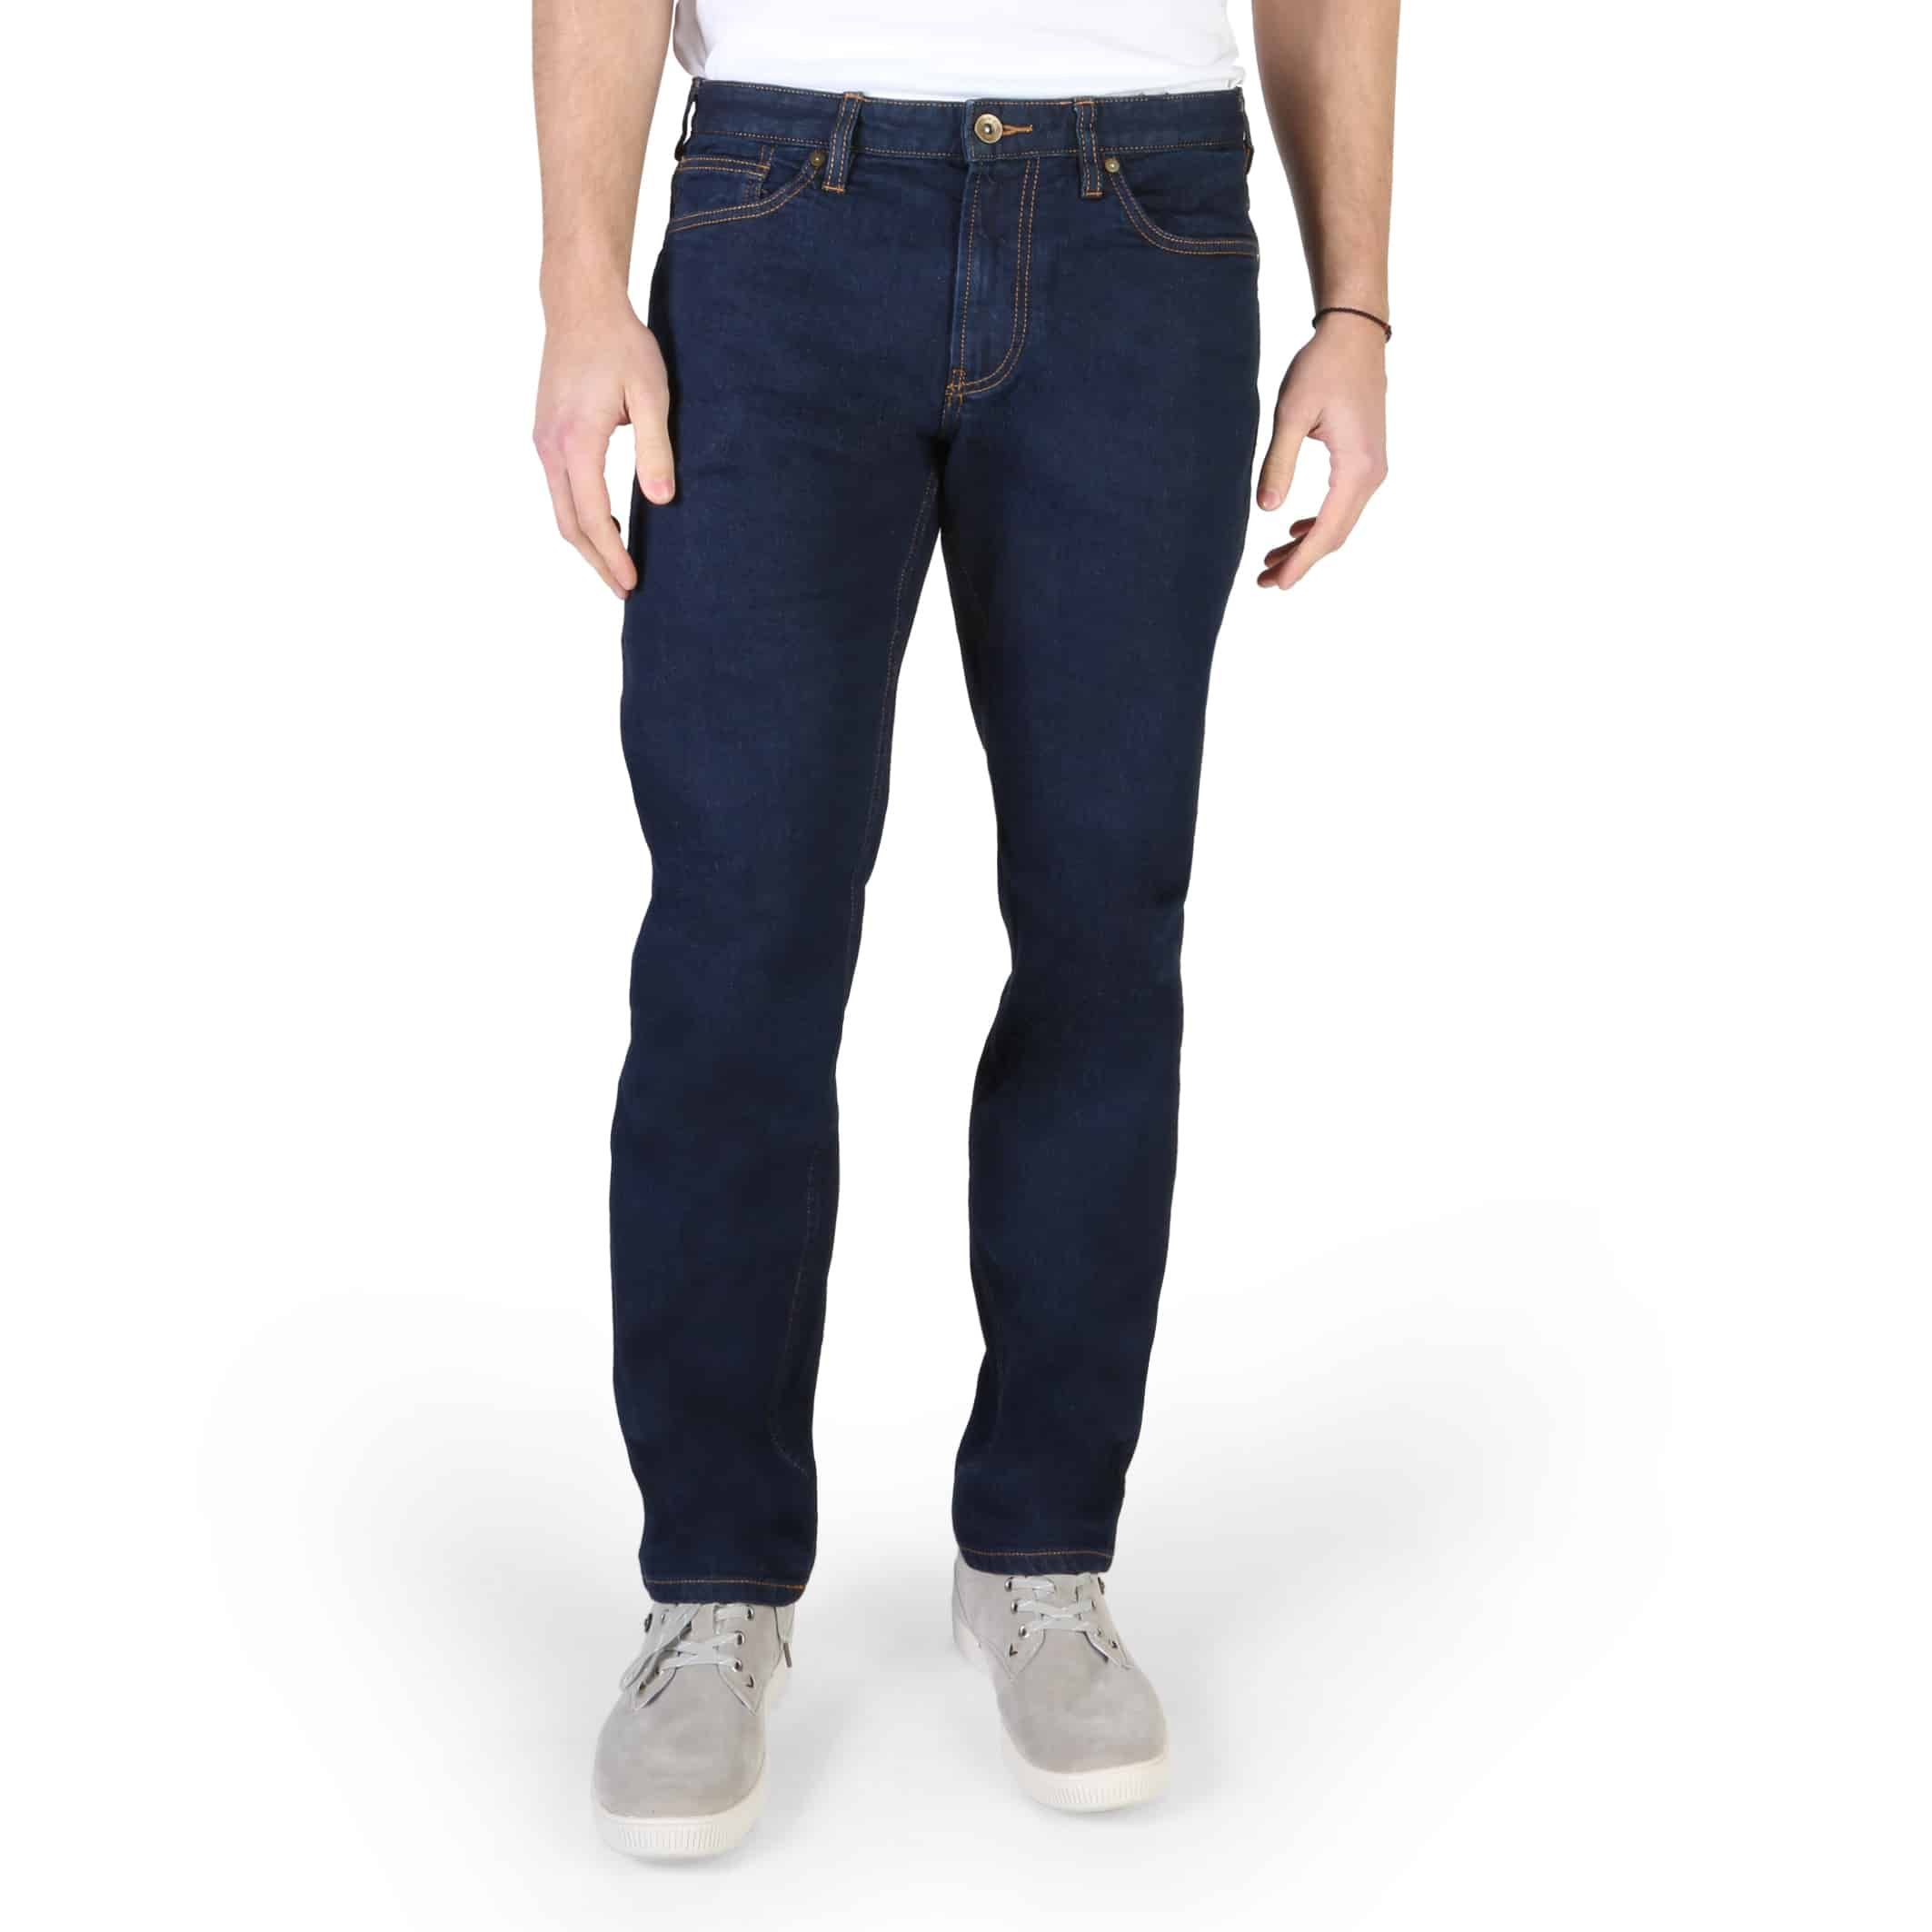 Clothing Armani Jeans – 3Y6J18_6DBFZ